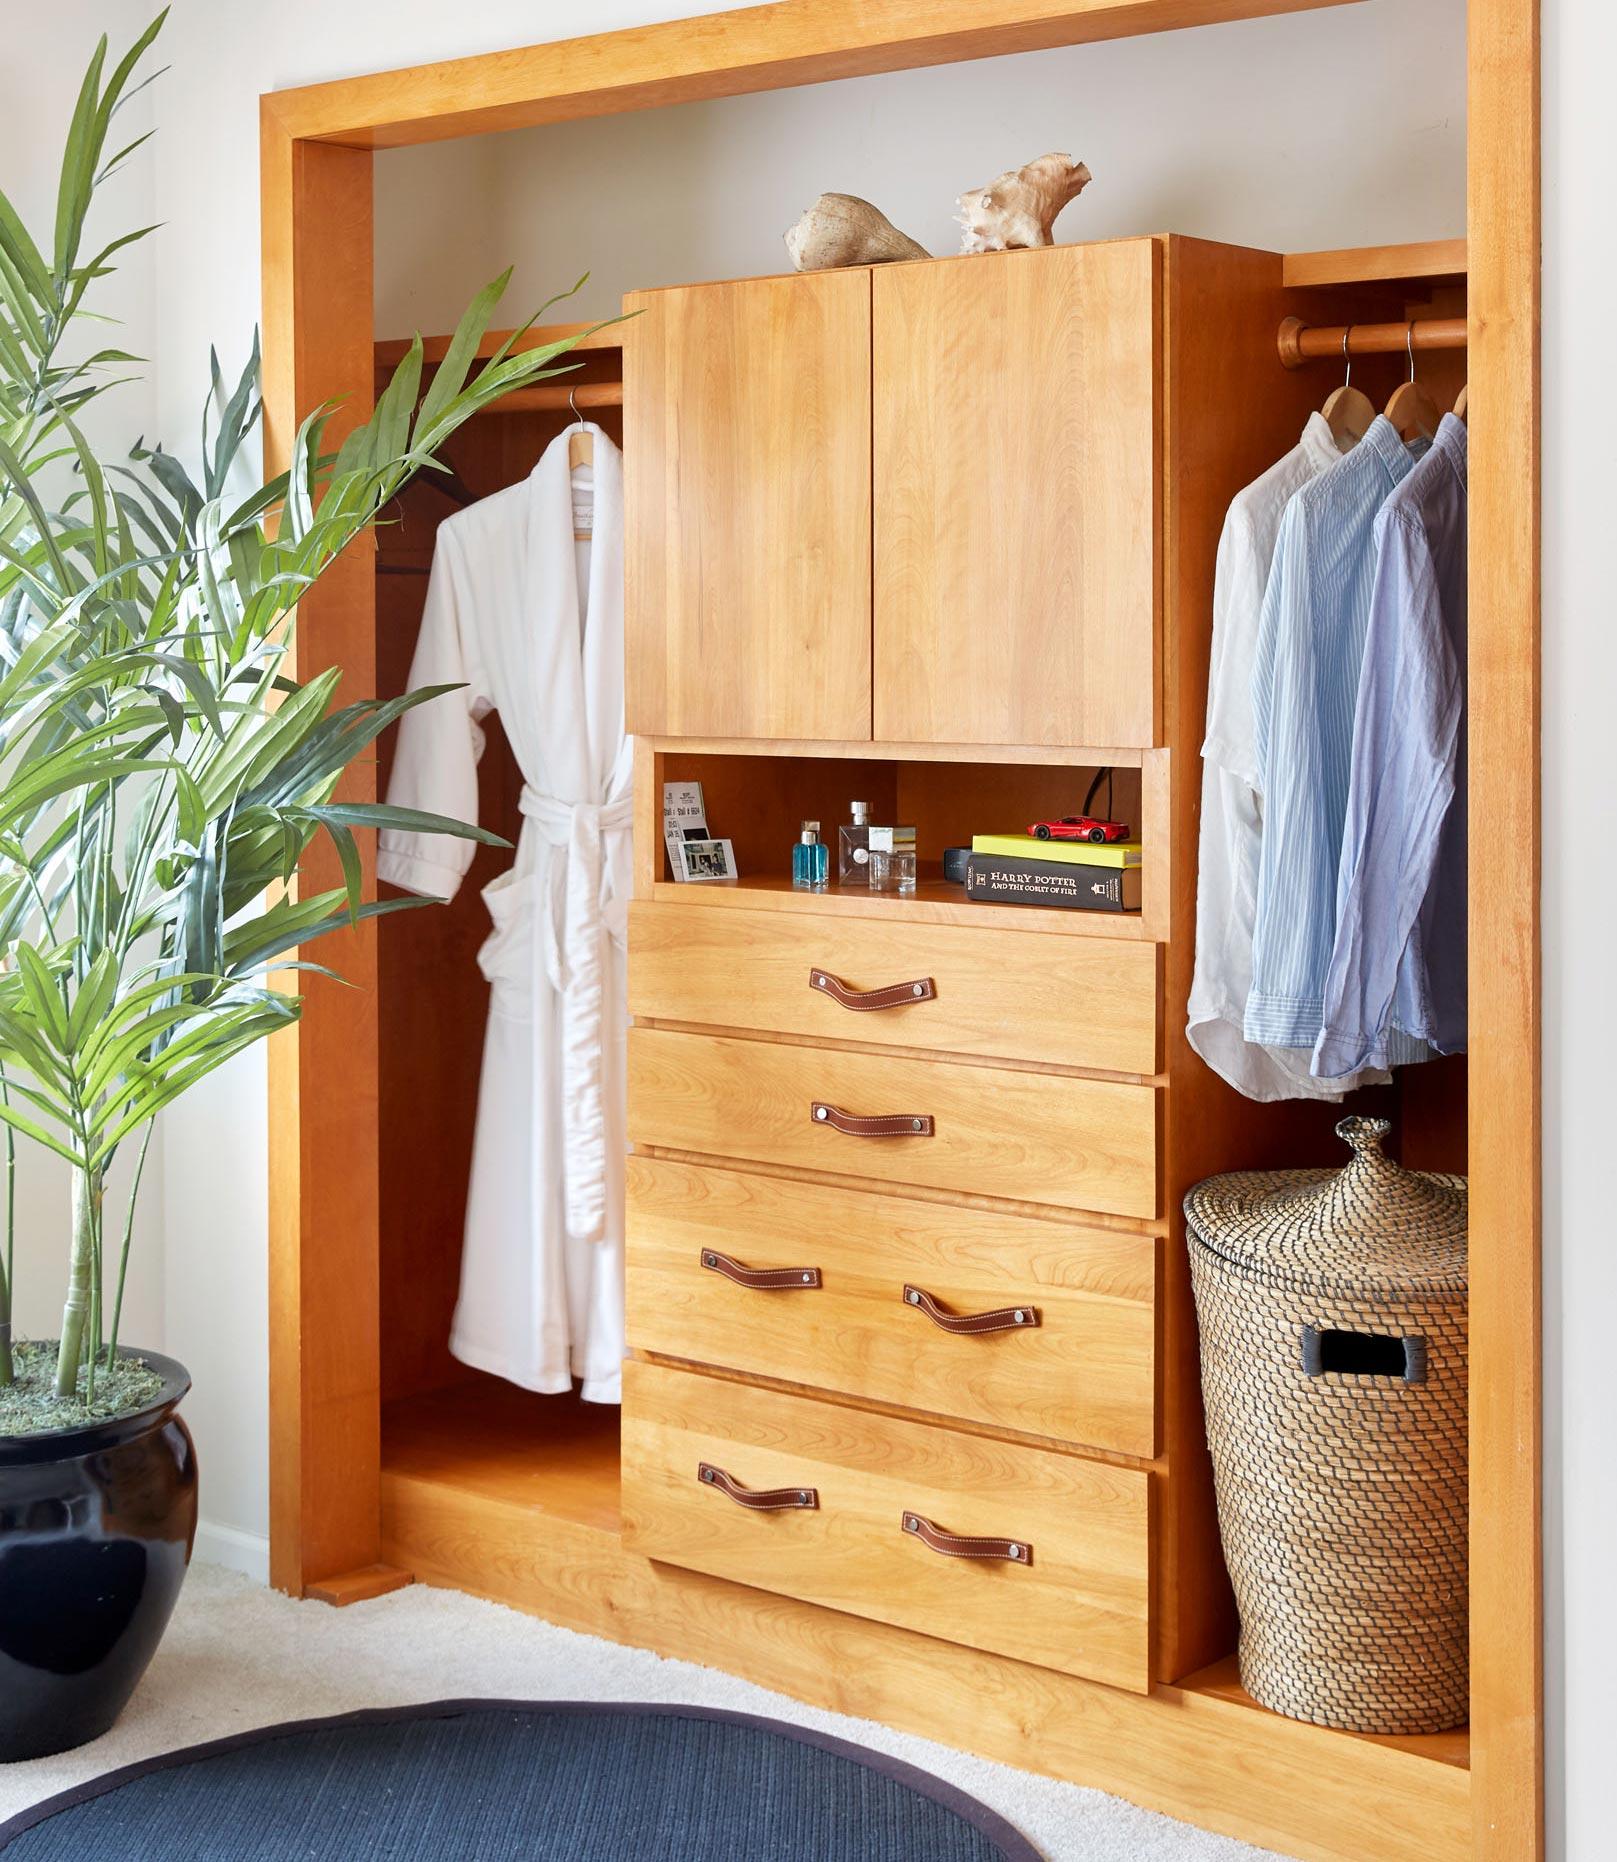 Bek bedroom cabinet